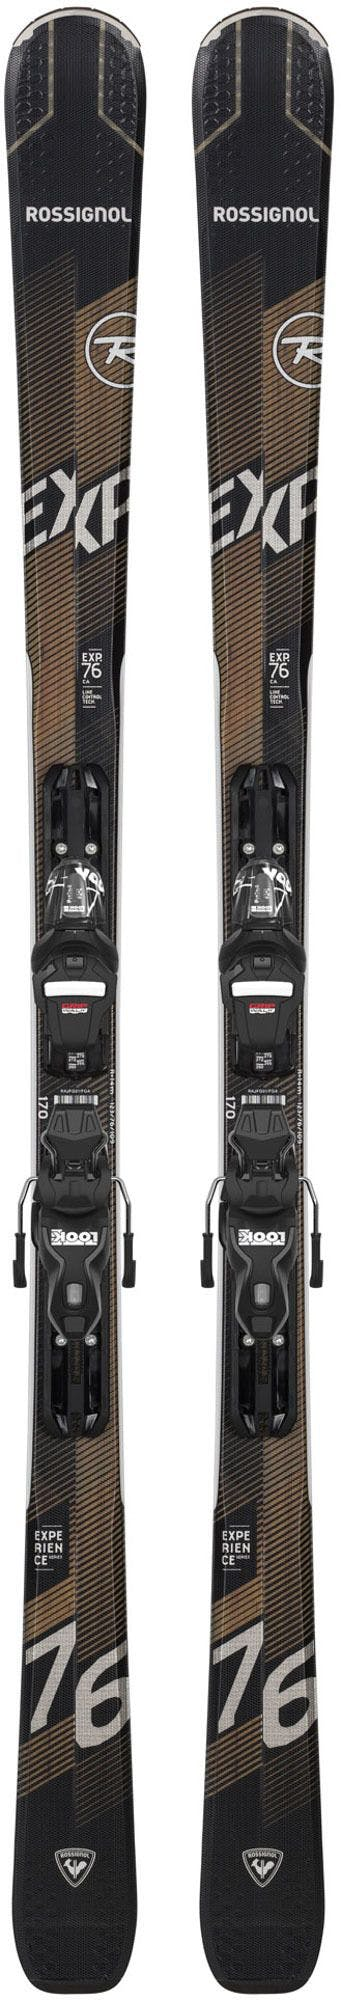 Rossignol Experience 76 CI Skis + Xpress 11 Gw Bindings · 2021